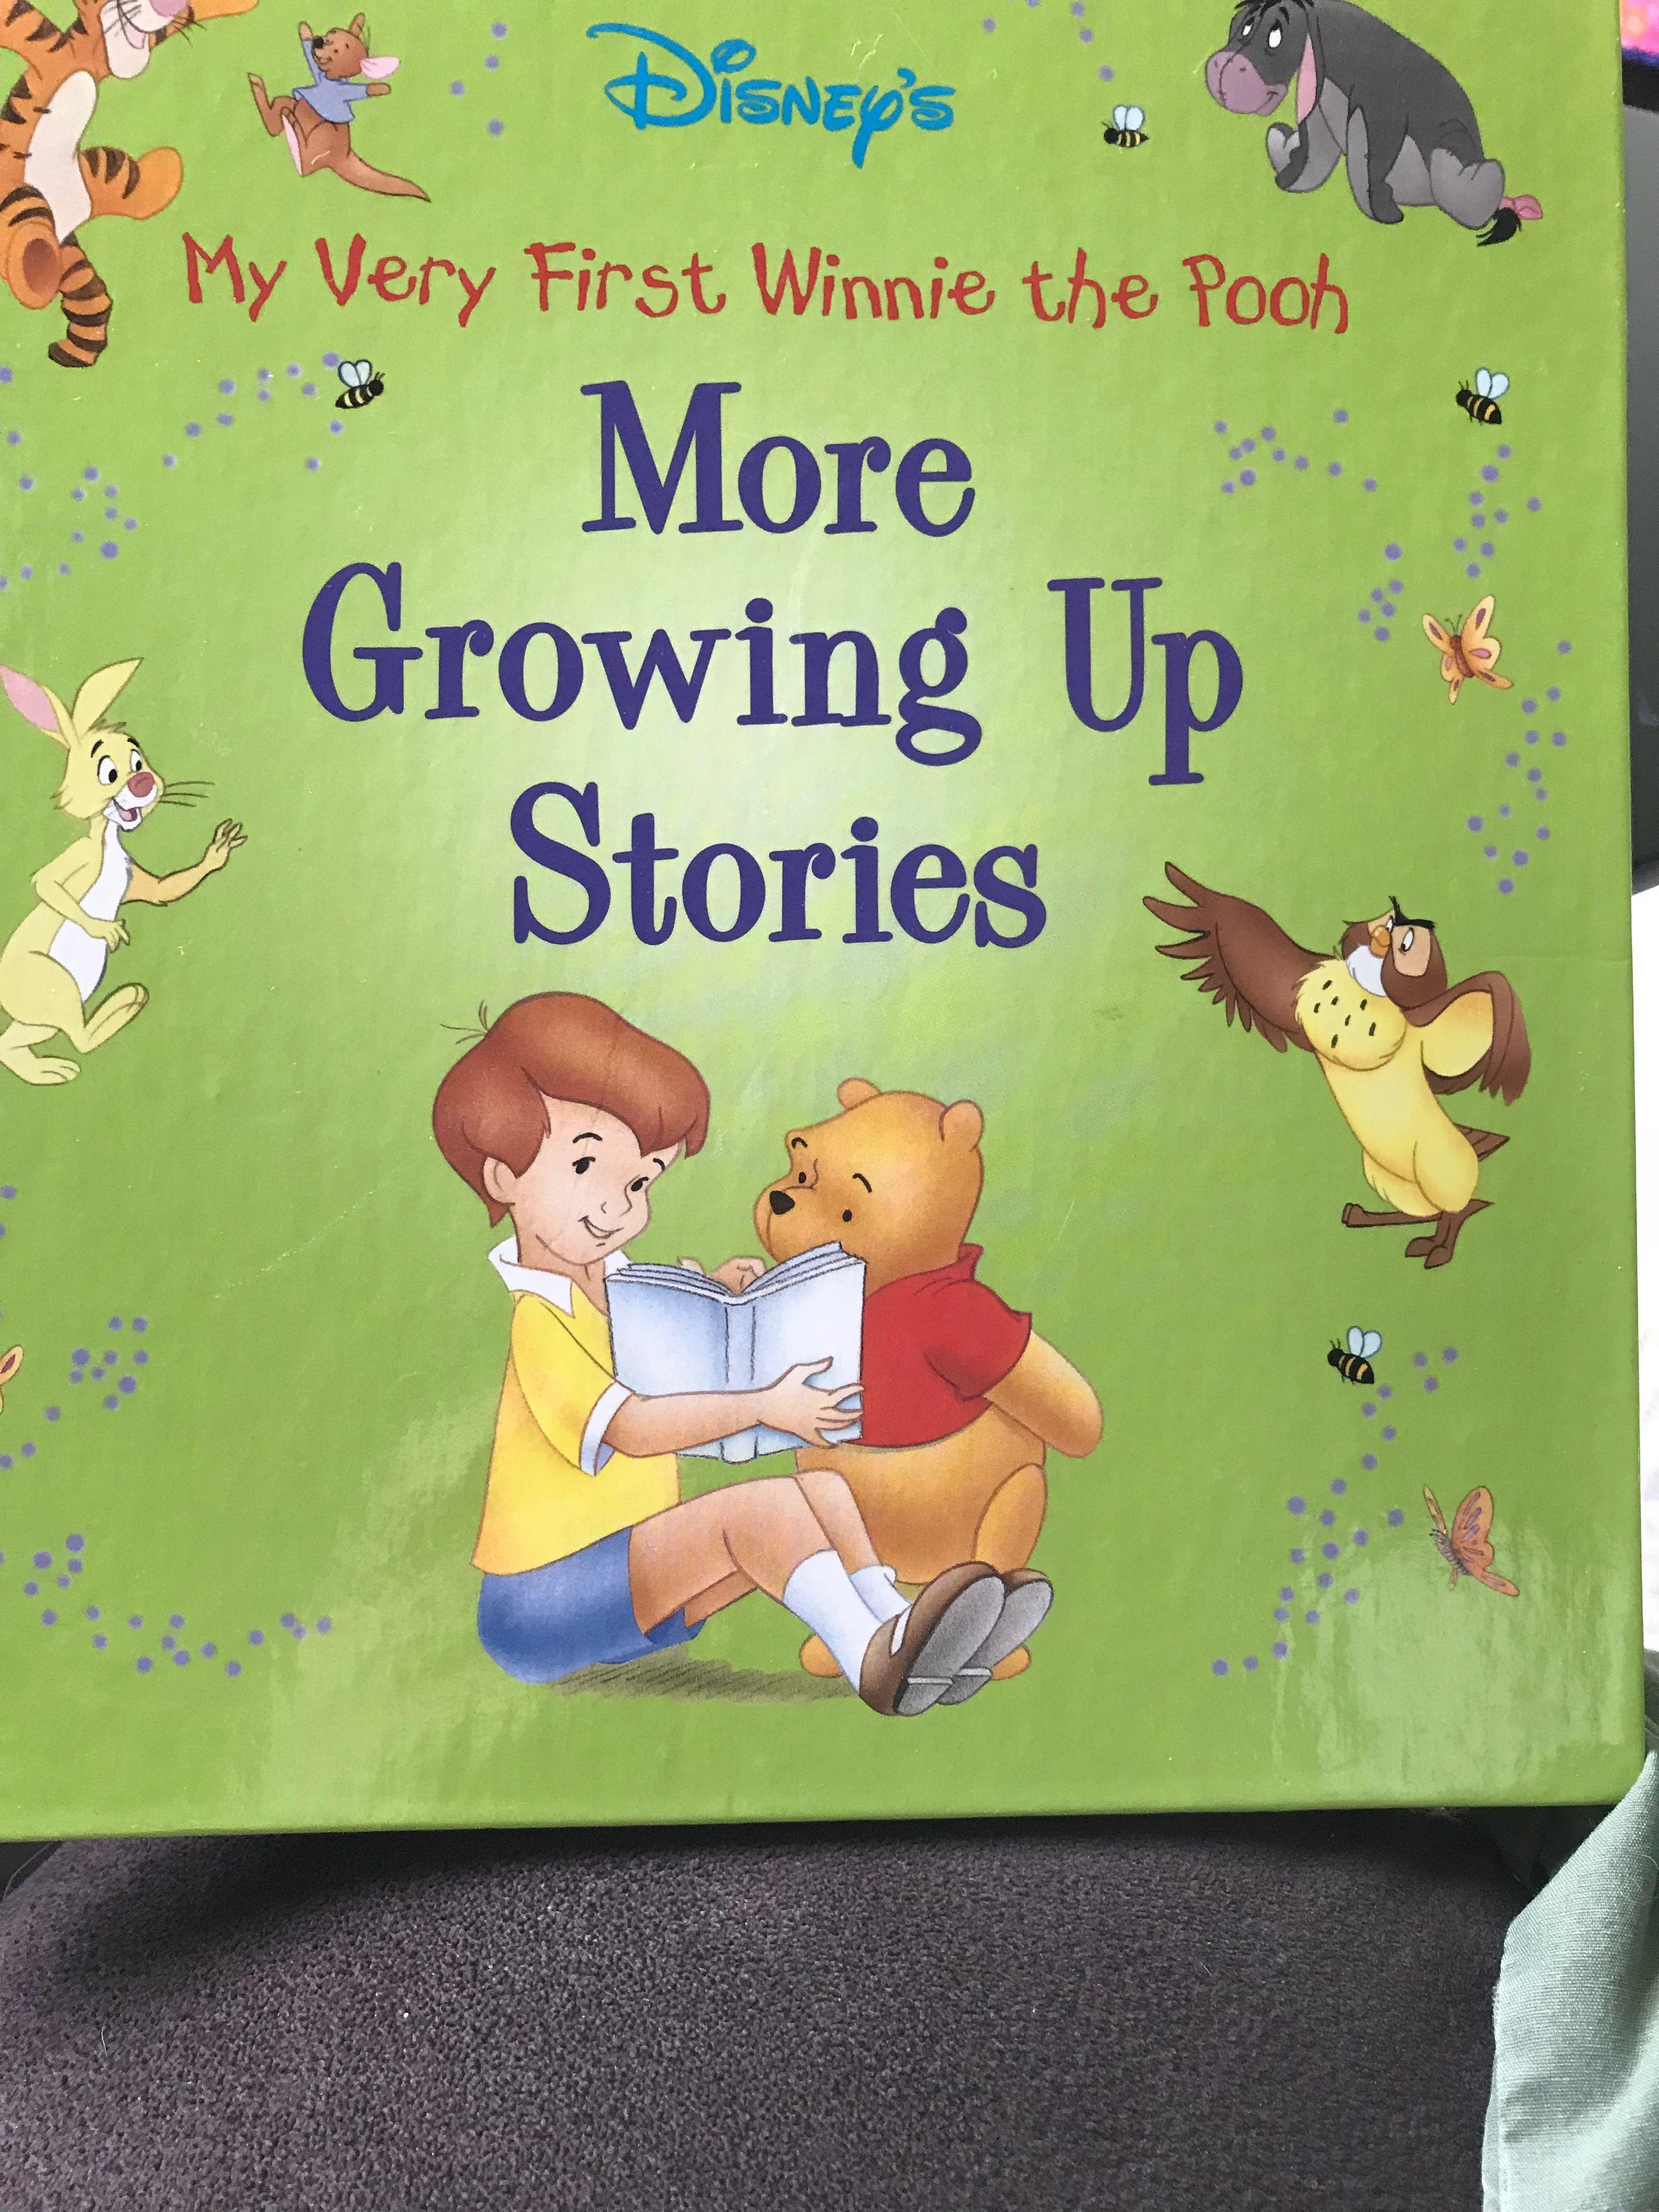 Pin by Megan Weeks on Disney Storybooks/Coloring Books   Pinterest ...